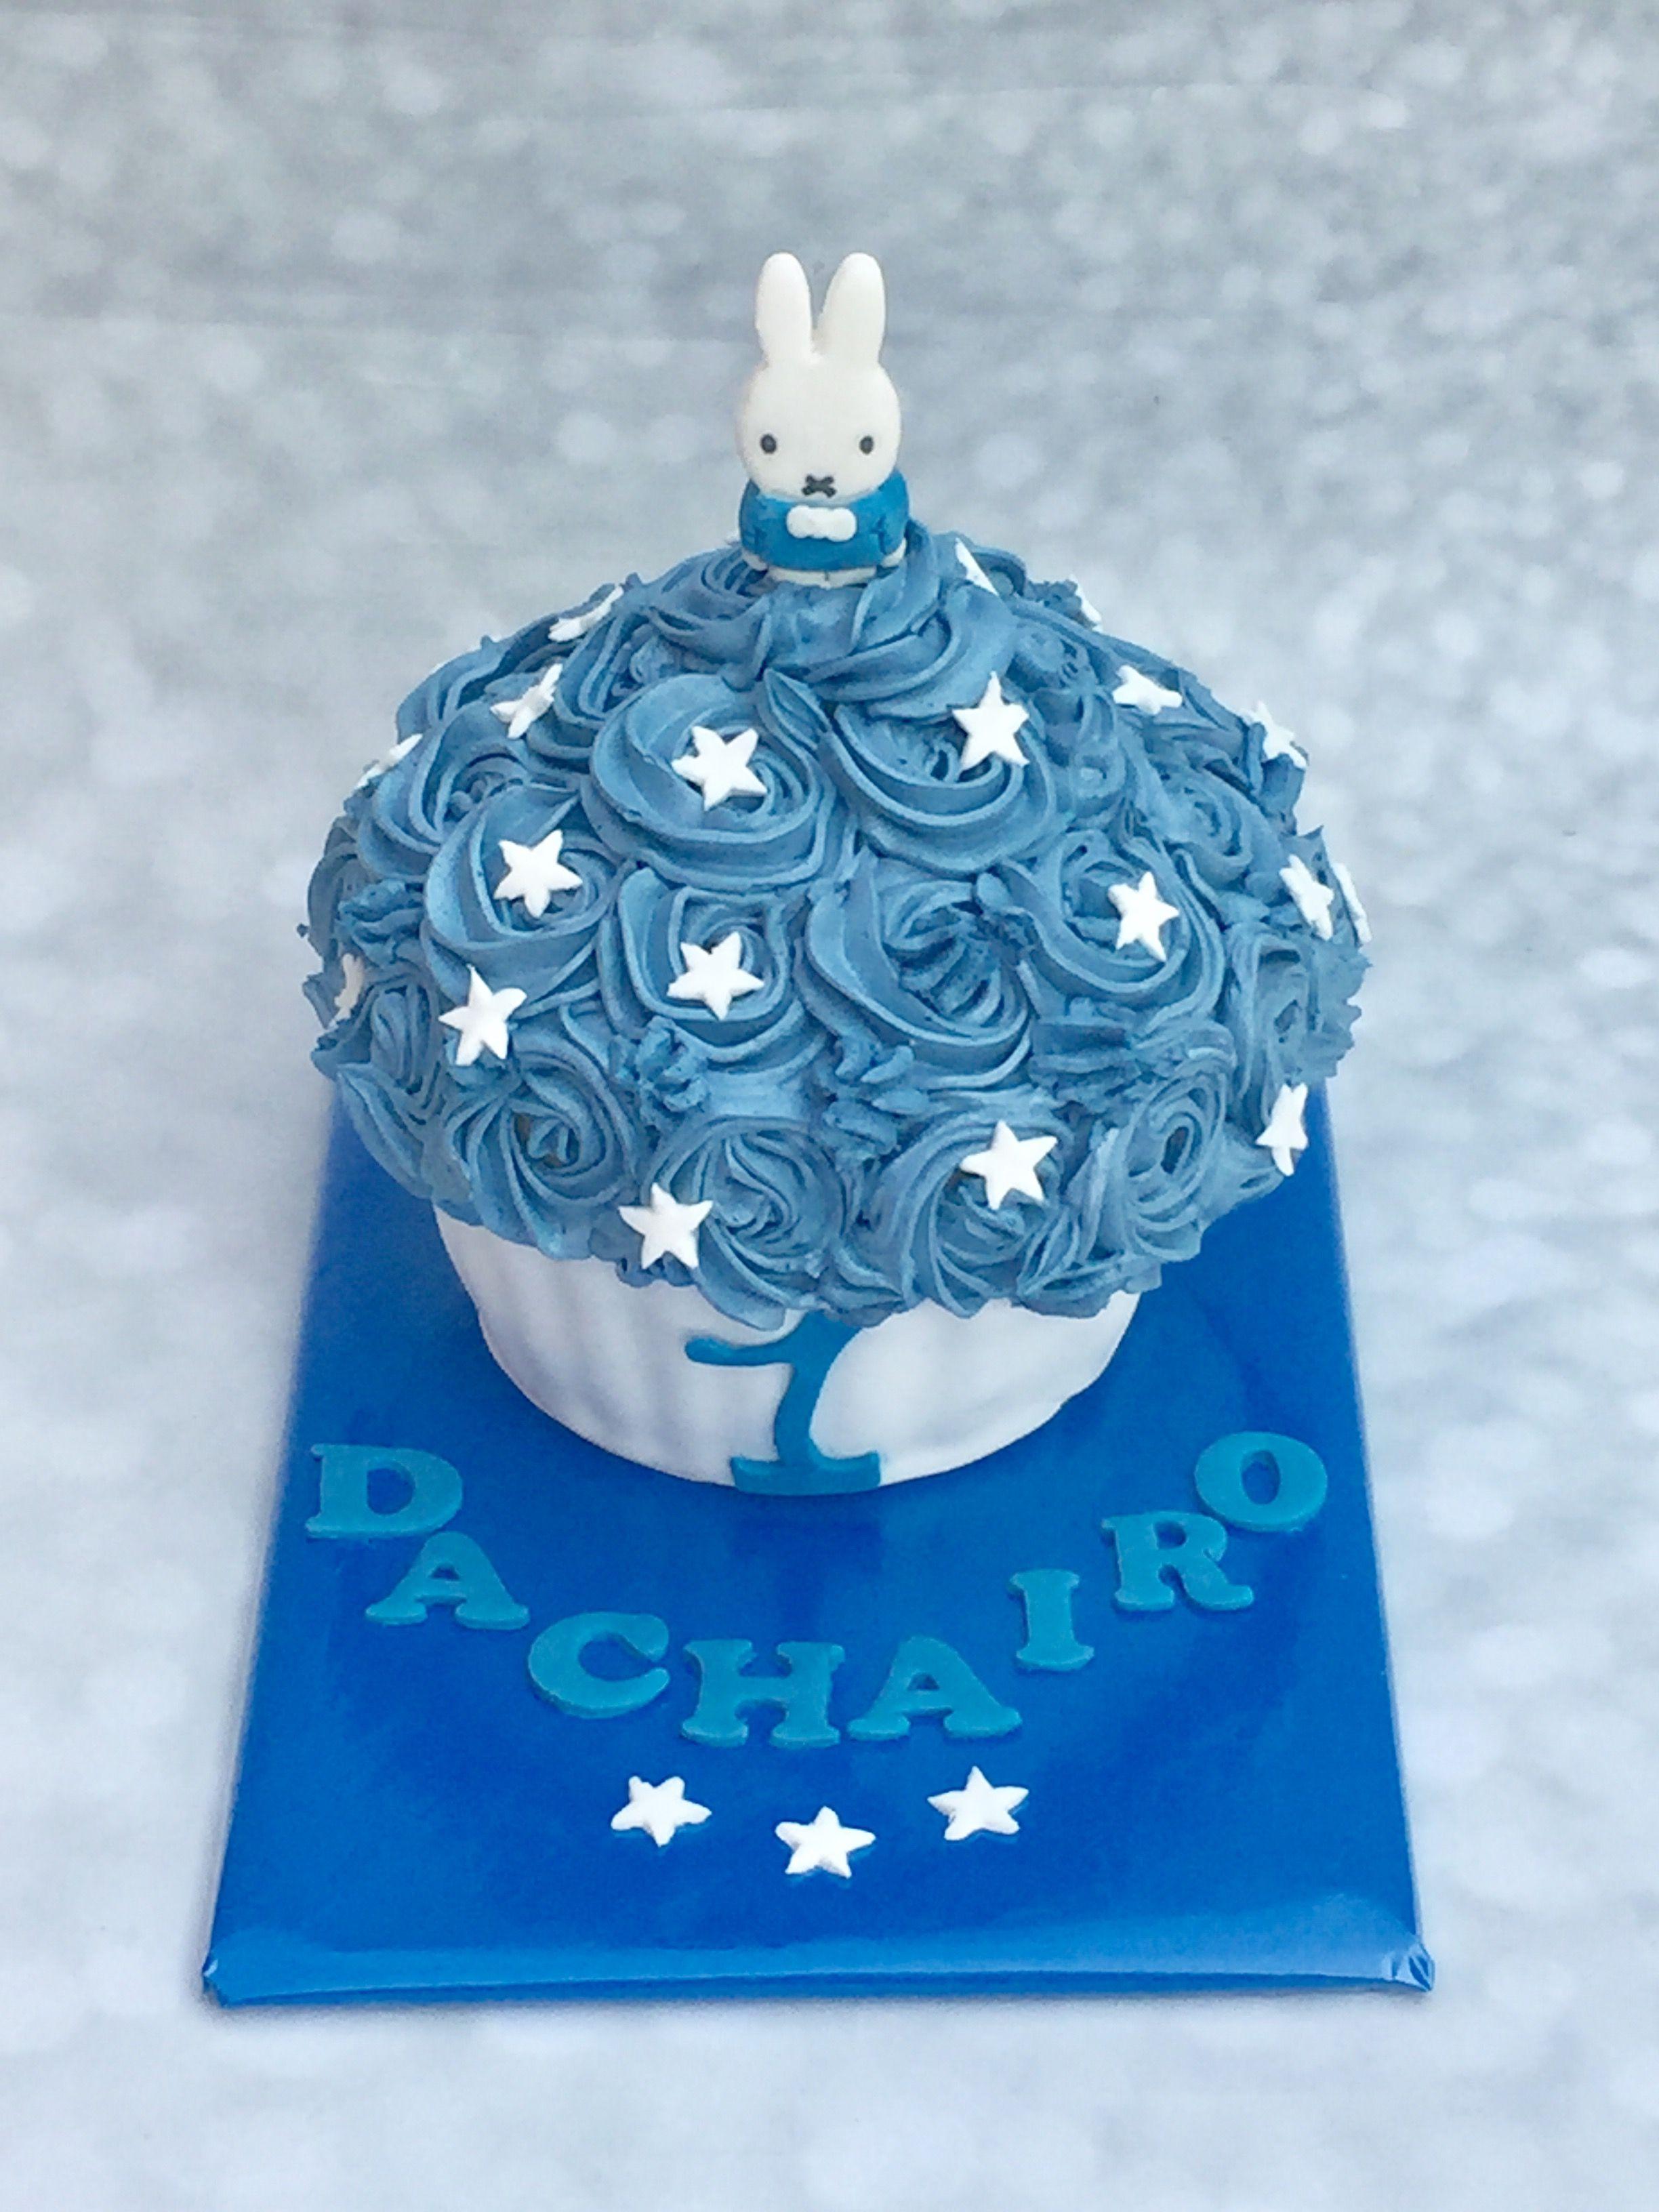 Giant Cupcake / smash cake met het bekende konijntje.